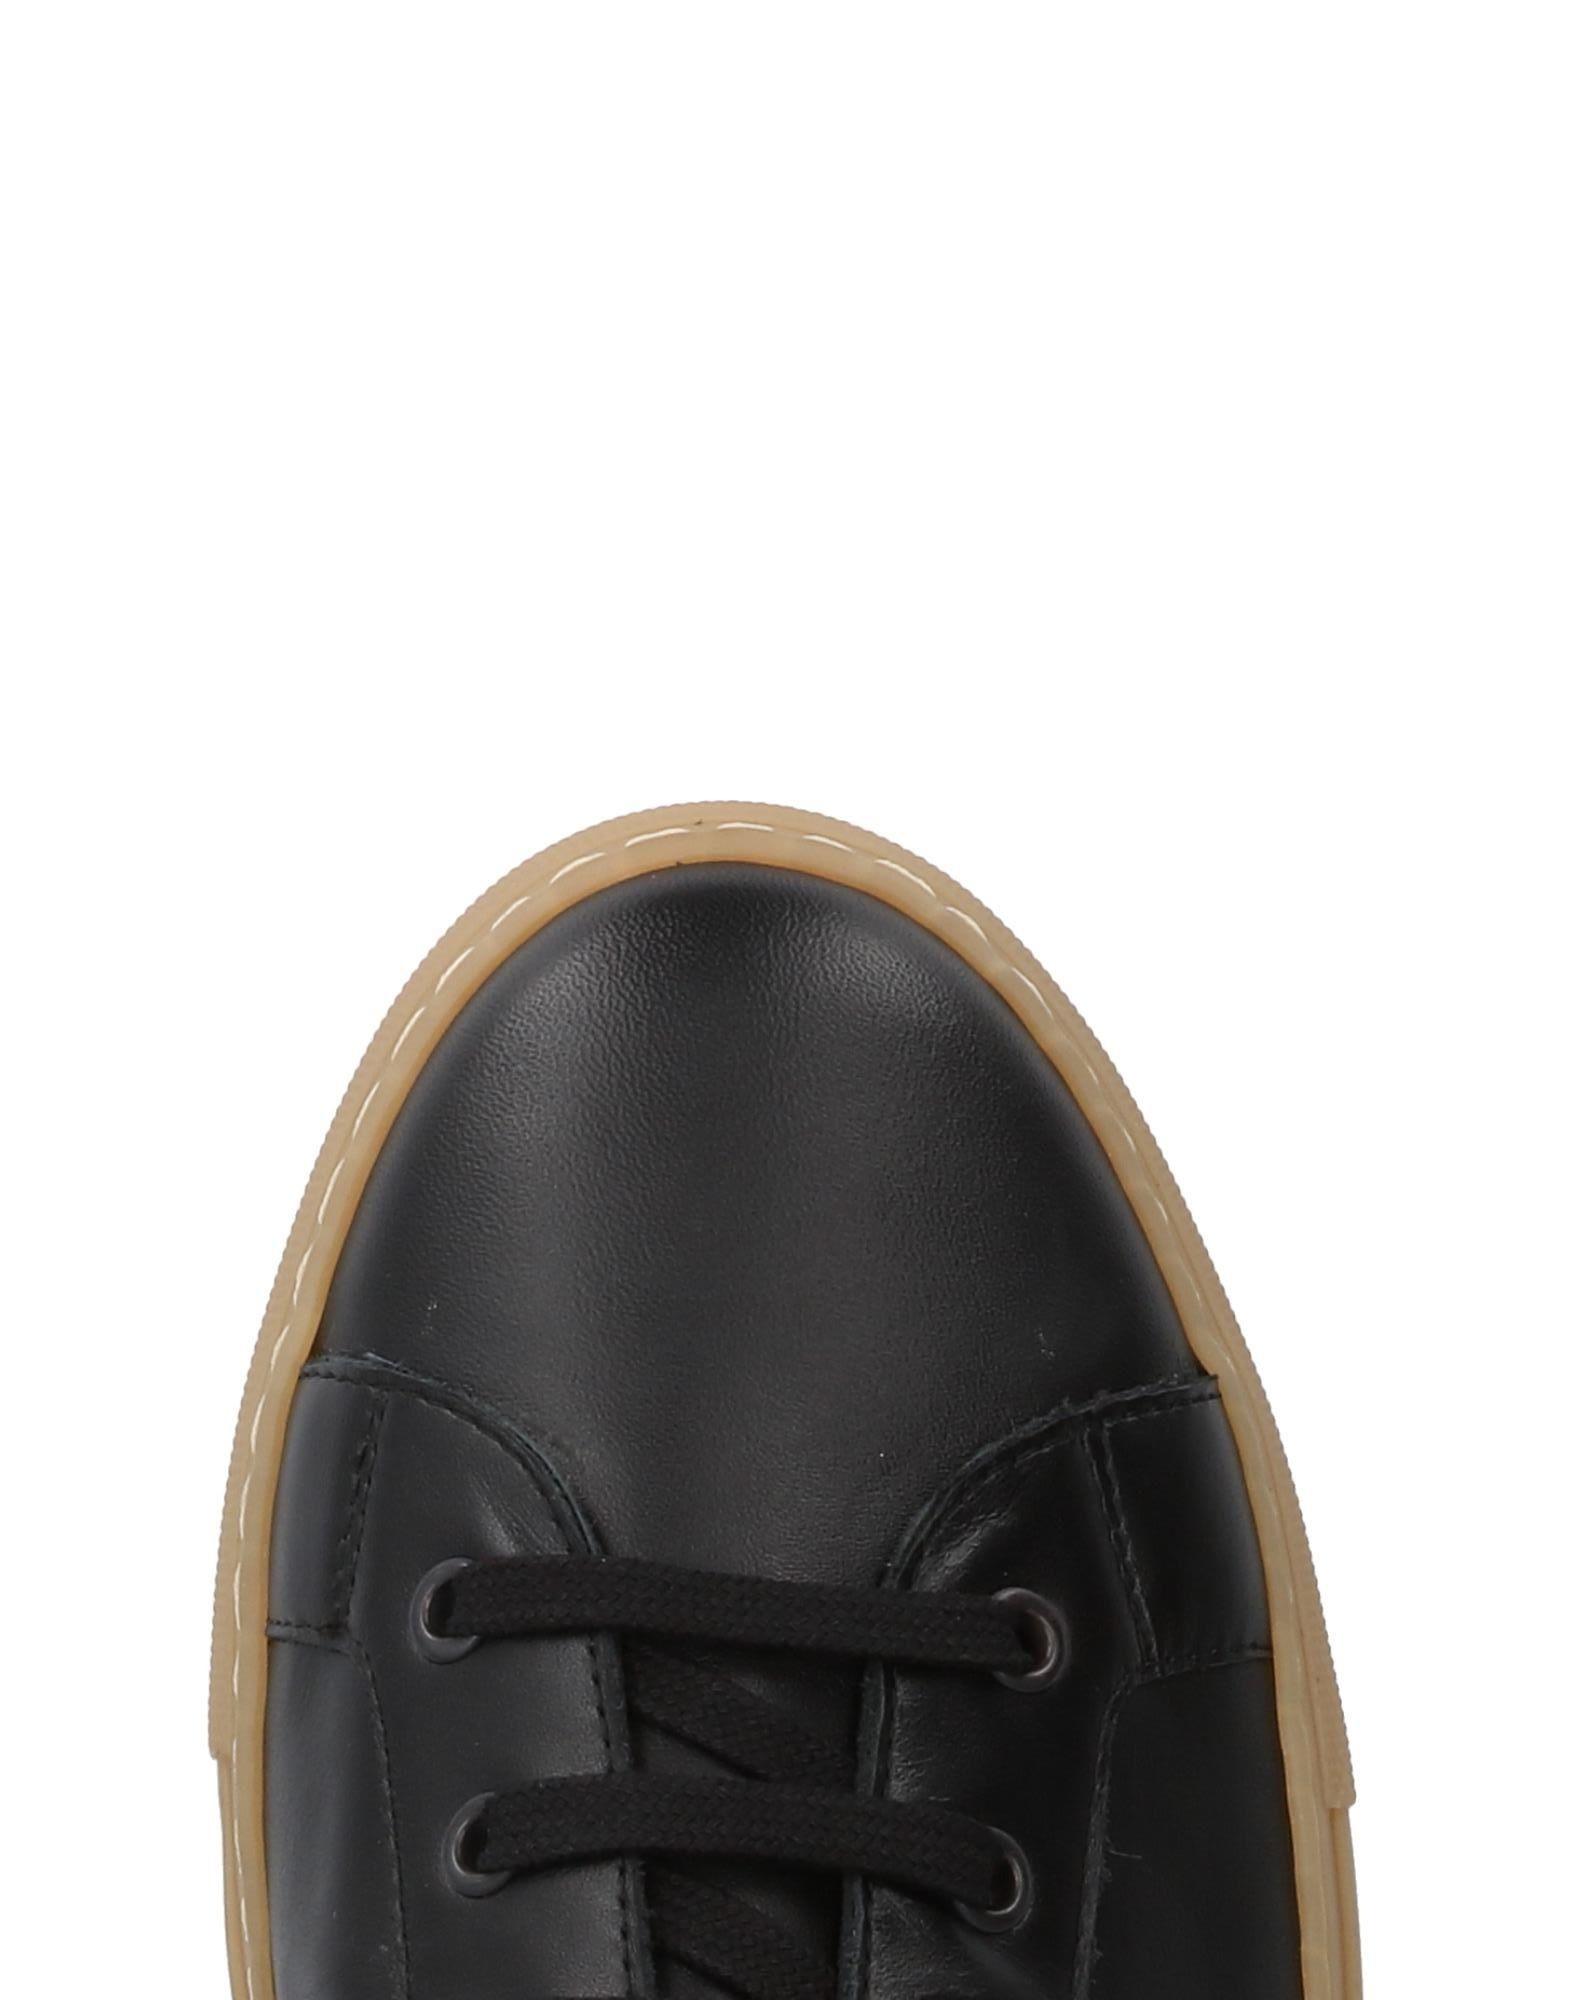 Dibrera By  Paolo Zanoli Sneakers Herren  By 11445851LU Gute Qualität beliebte Schuhe 79e0d5